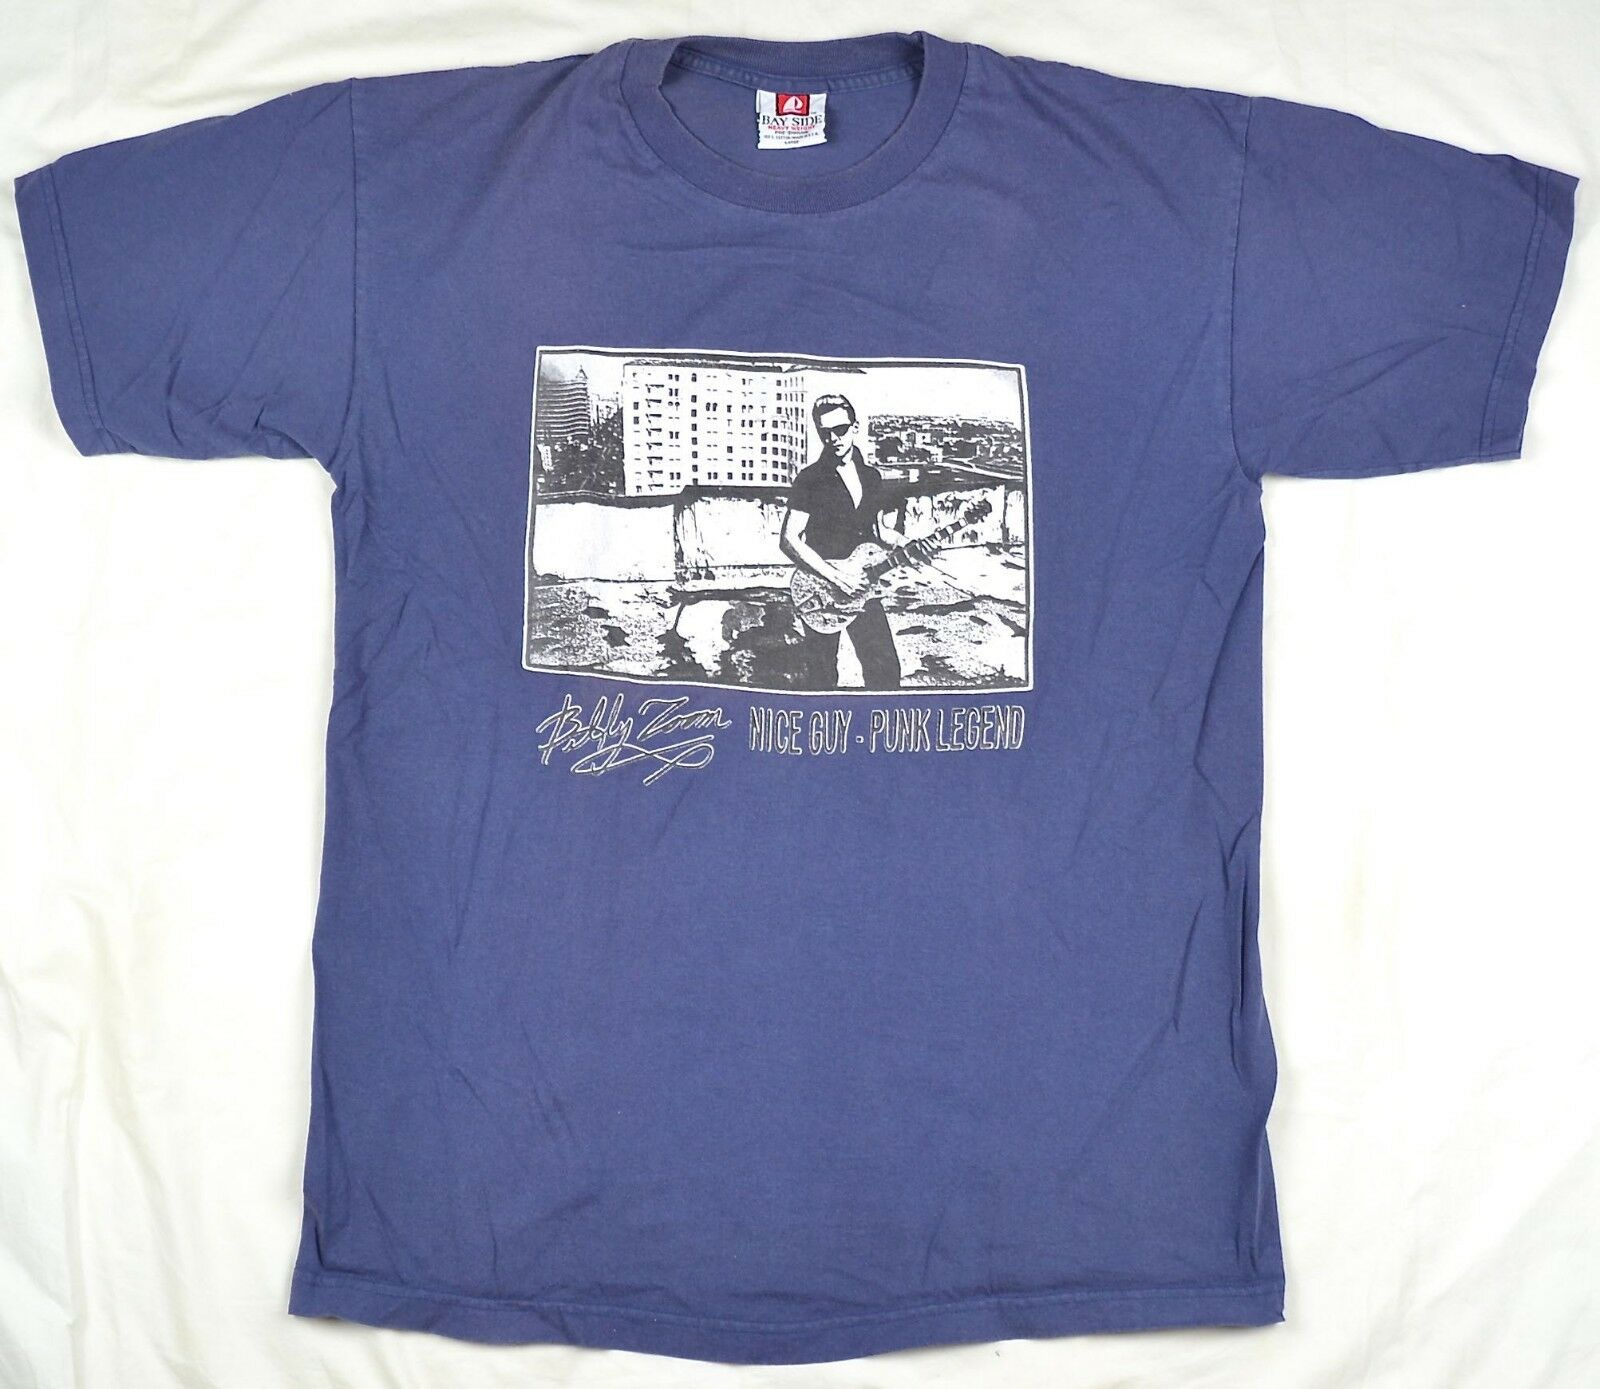 Rare Vintage Billy Zoom Nice Guy Pistol Punk Legend X Guitarist Pistol Guy T-Shirt L Large e03637